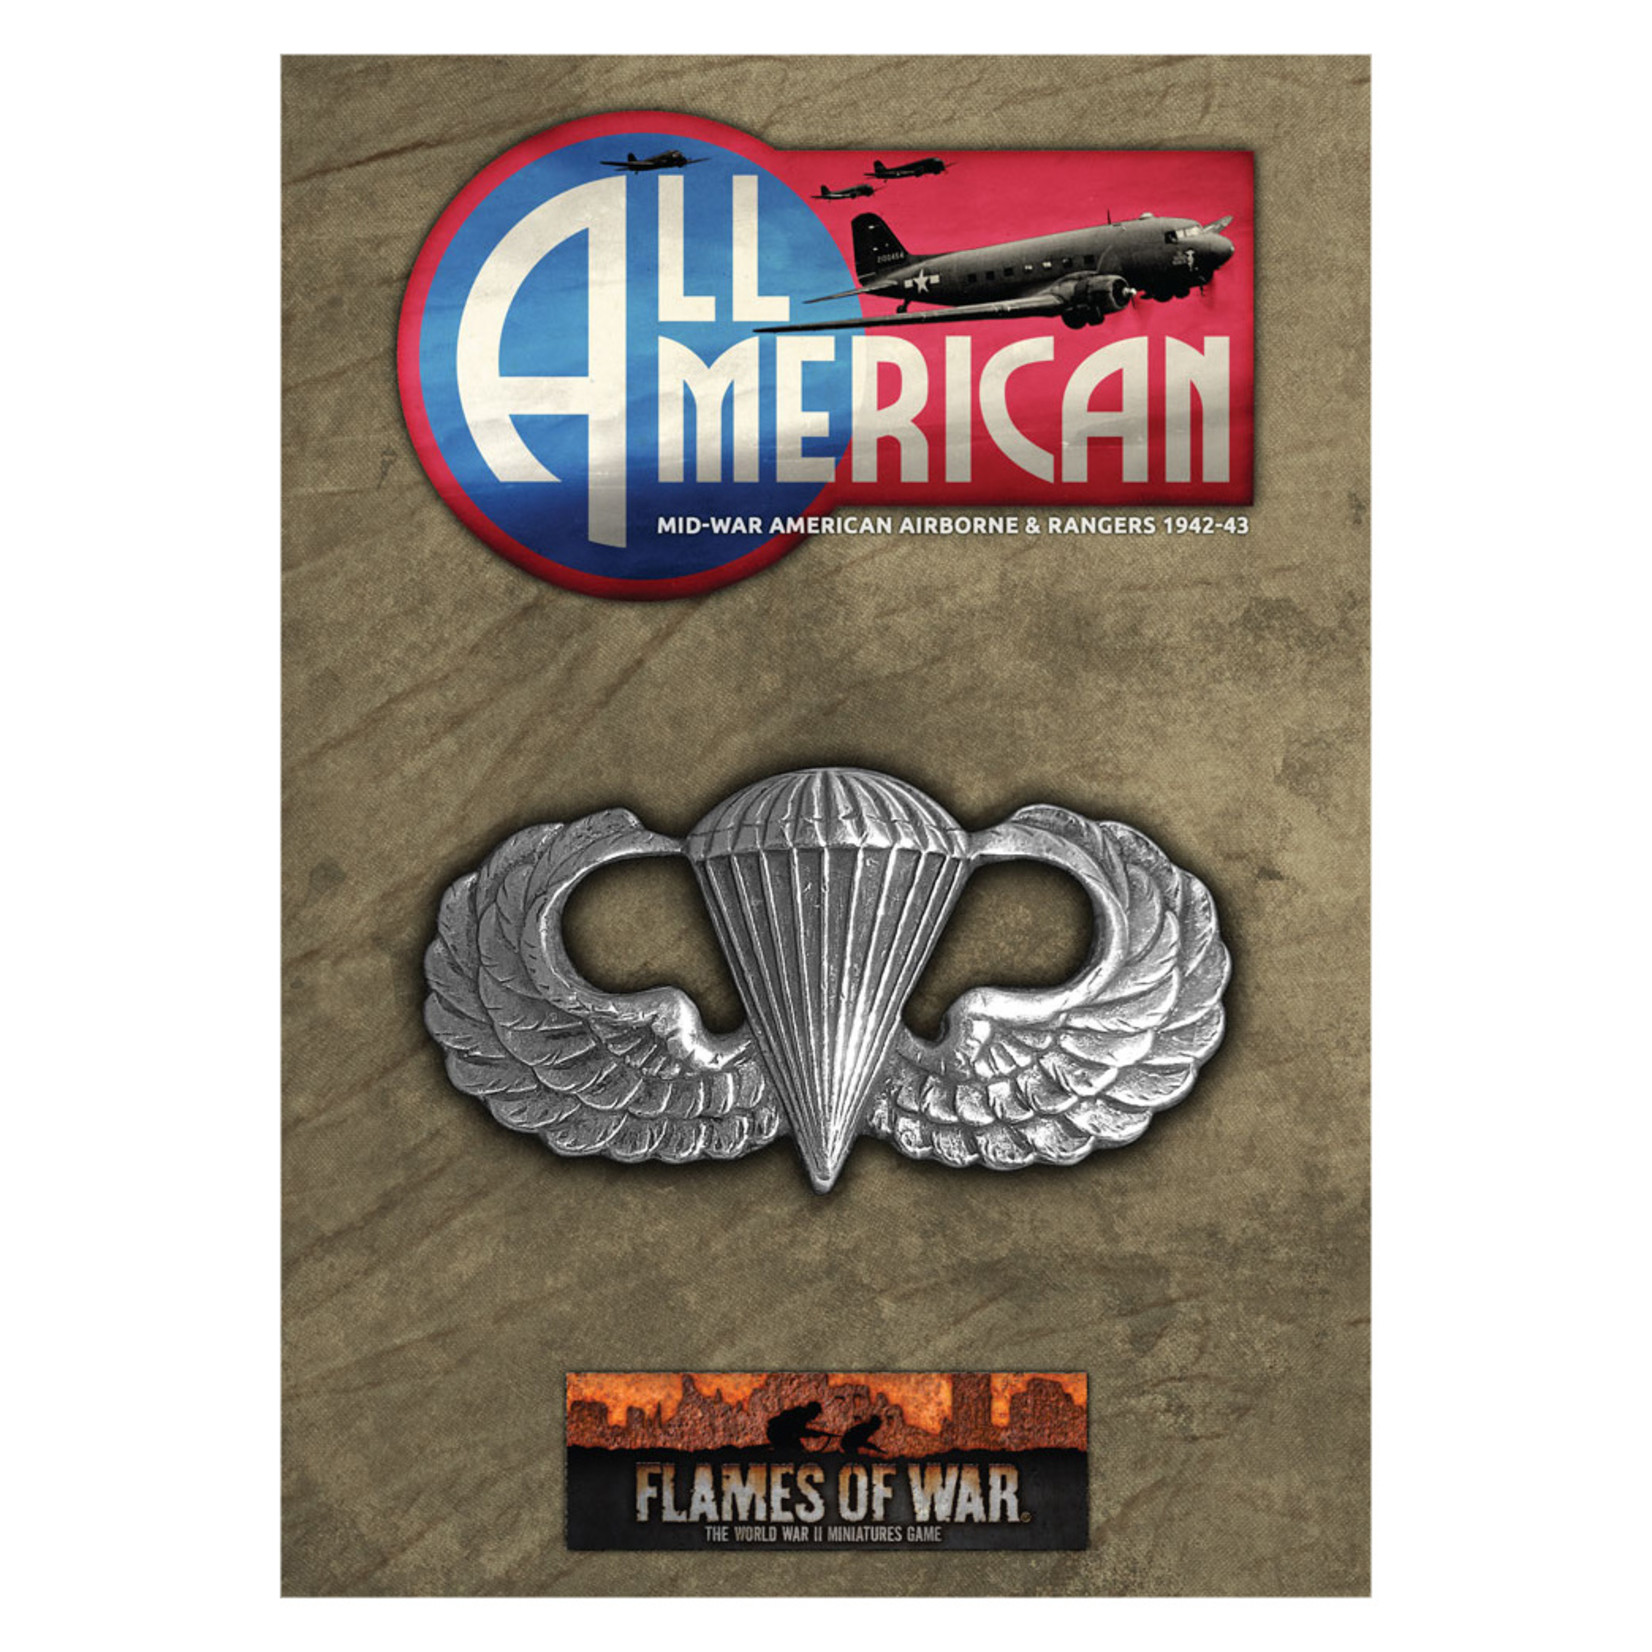 Battlefront Miniatures Ltd Flames of War | All American Booklet & Cards